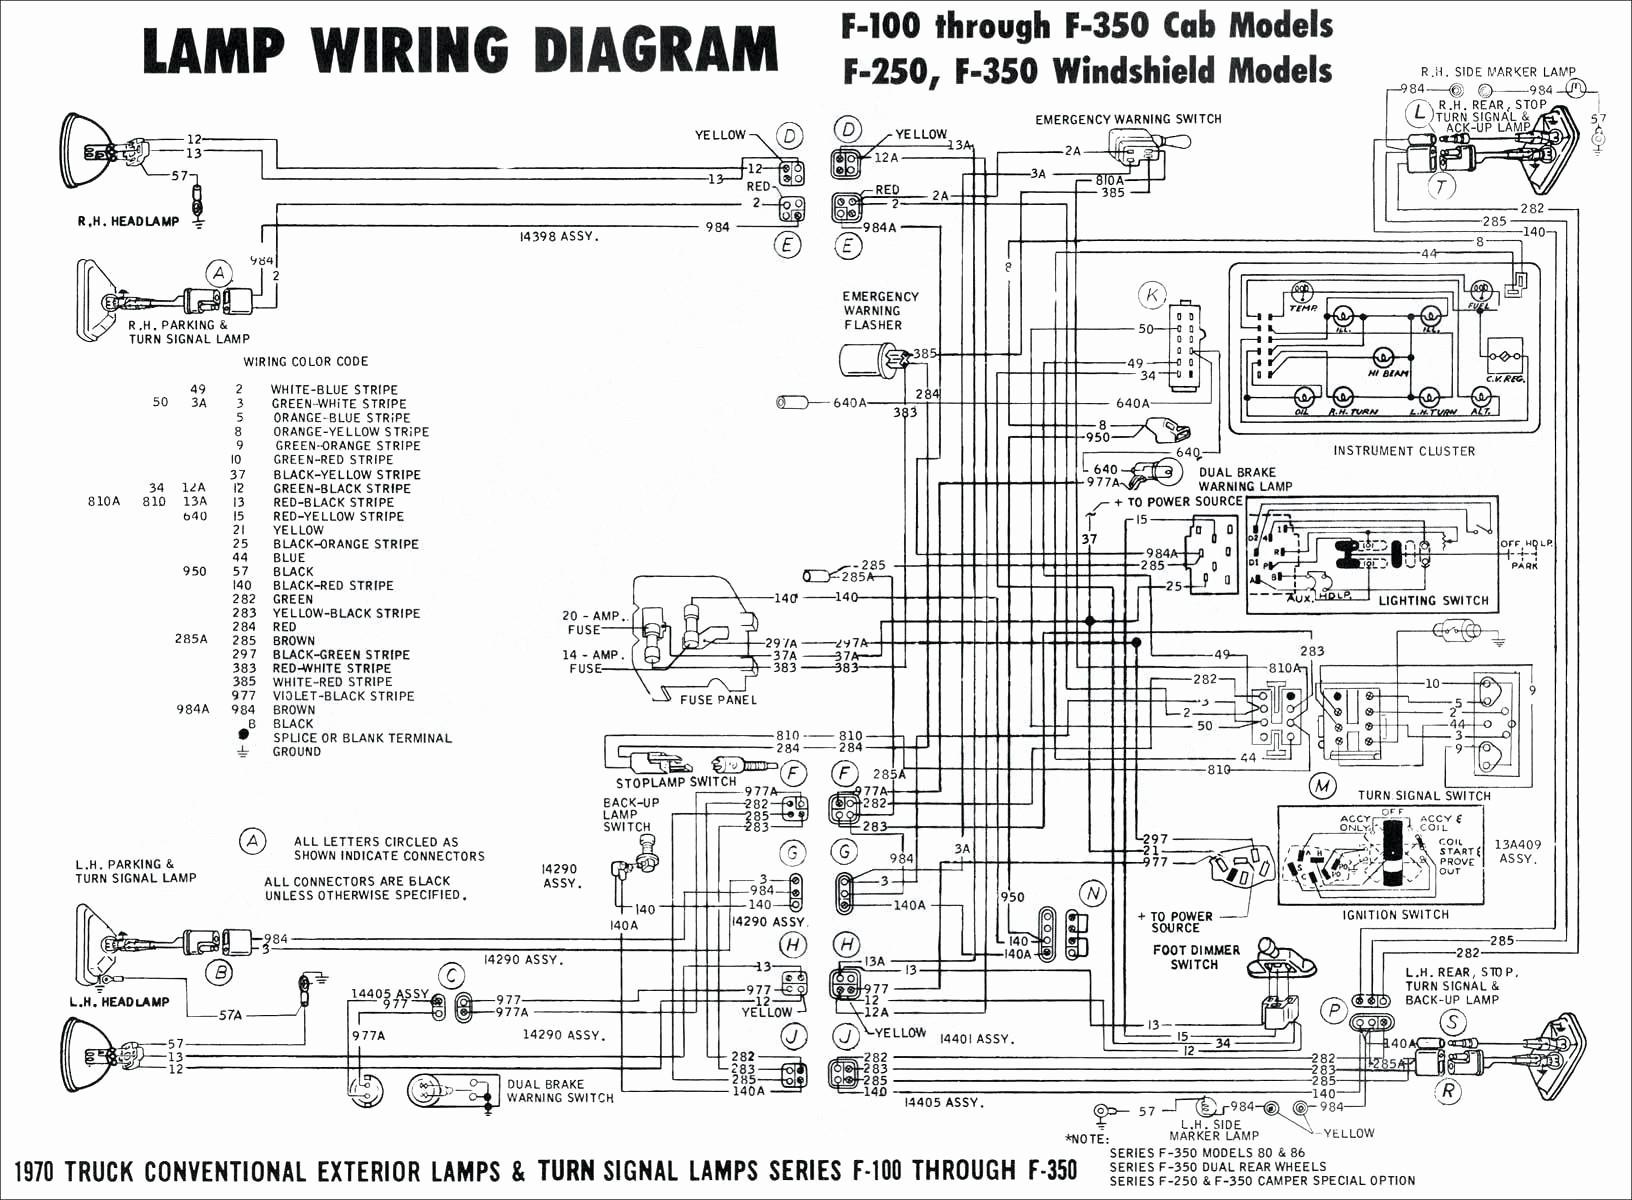 2000 ford F150 Ignition Switch Wiring Diagram Diagram] Basic Turn Signal Ke Wiring Diagram Full Version Hd Of 2000 ford F150 Ignition Switch Wiring Diagram Diagram] Motorcycle Wiring Diagram Explained Full Version Hd